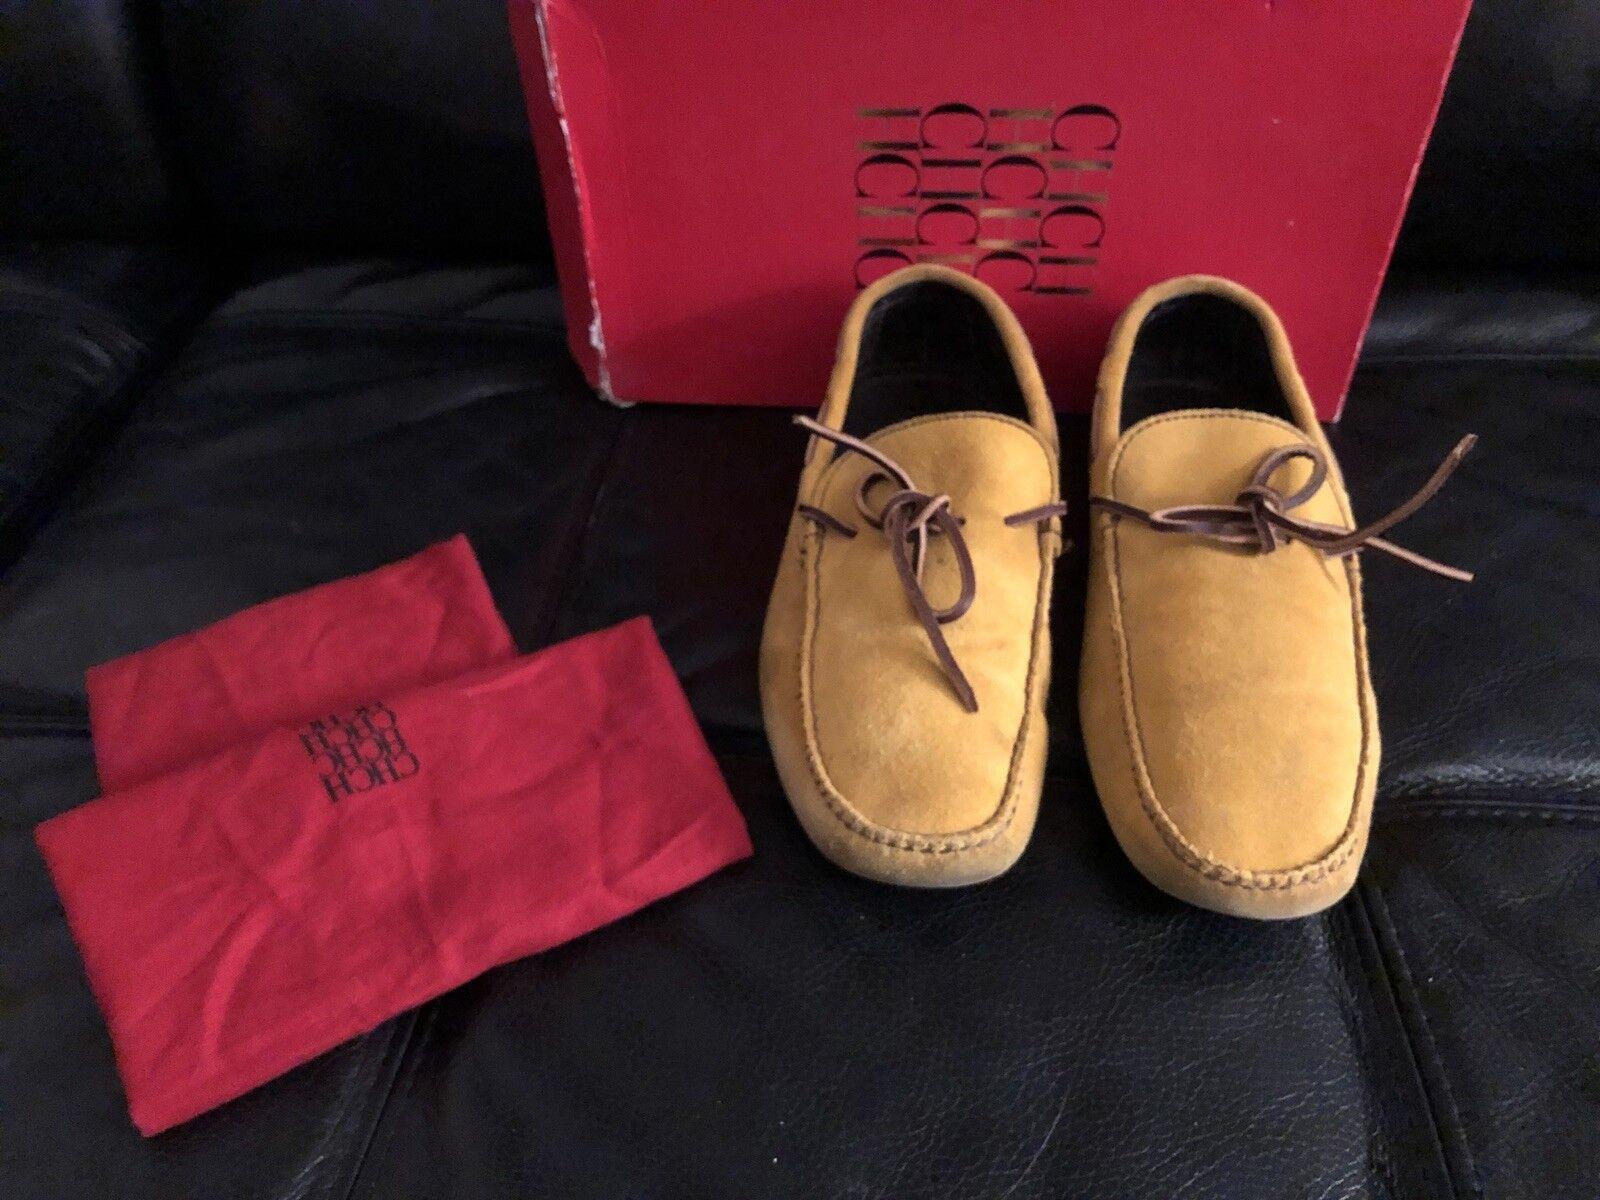 CH By Carolina Herrera  Mustard Suede Men's Mocassin Loafers shoes Sz 8